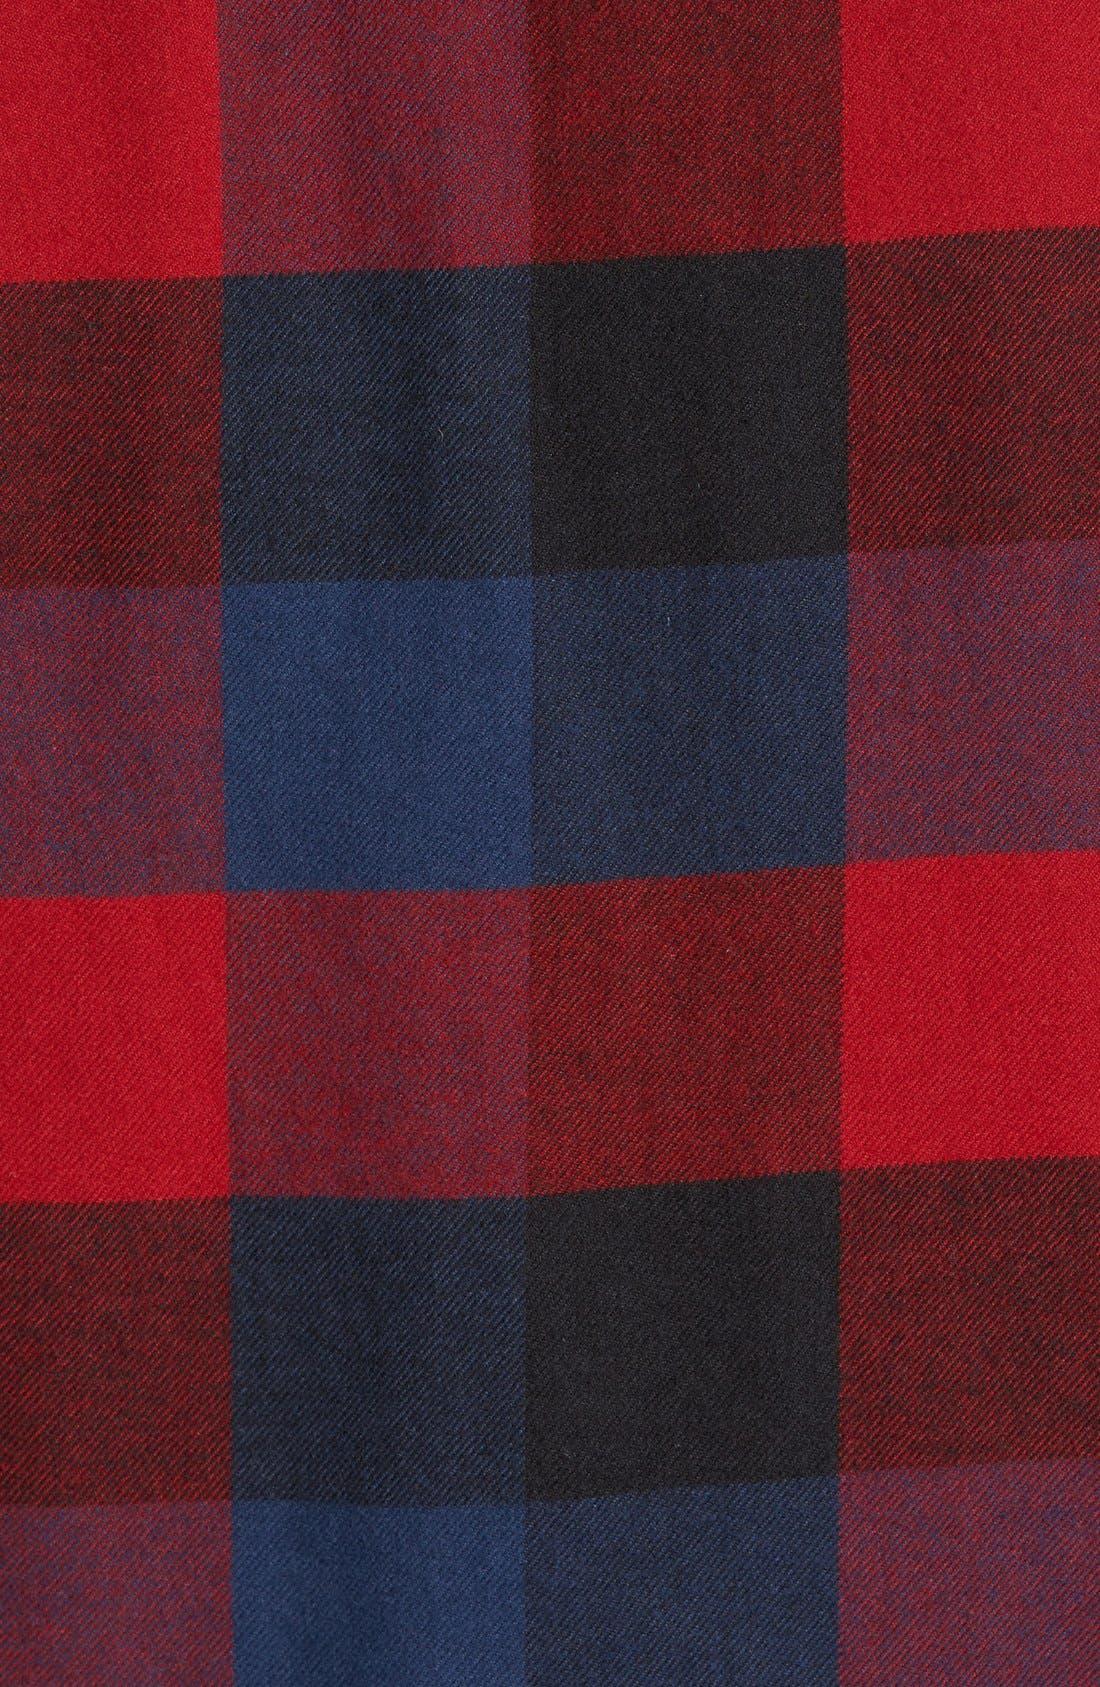 Trim Fit Check Flannel Woven Shirt,                             Alternate thumbnail 20, color,